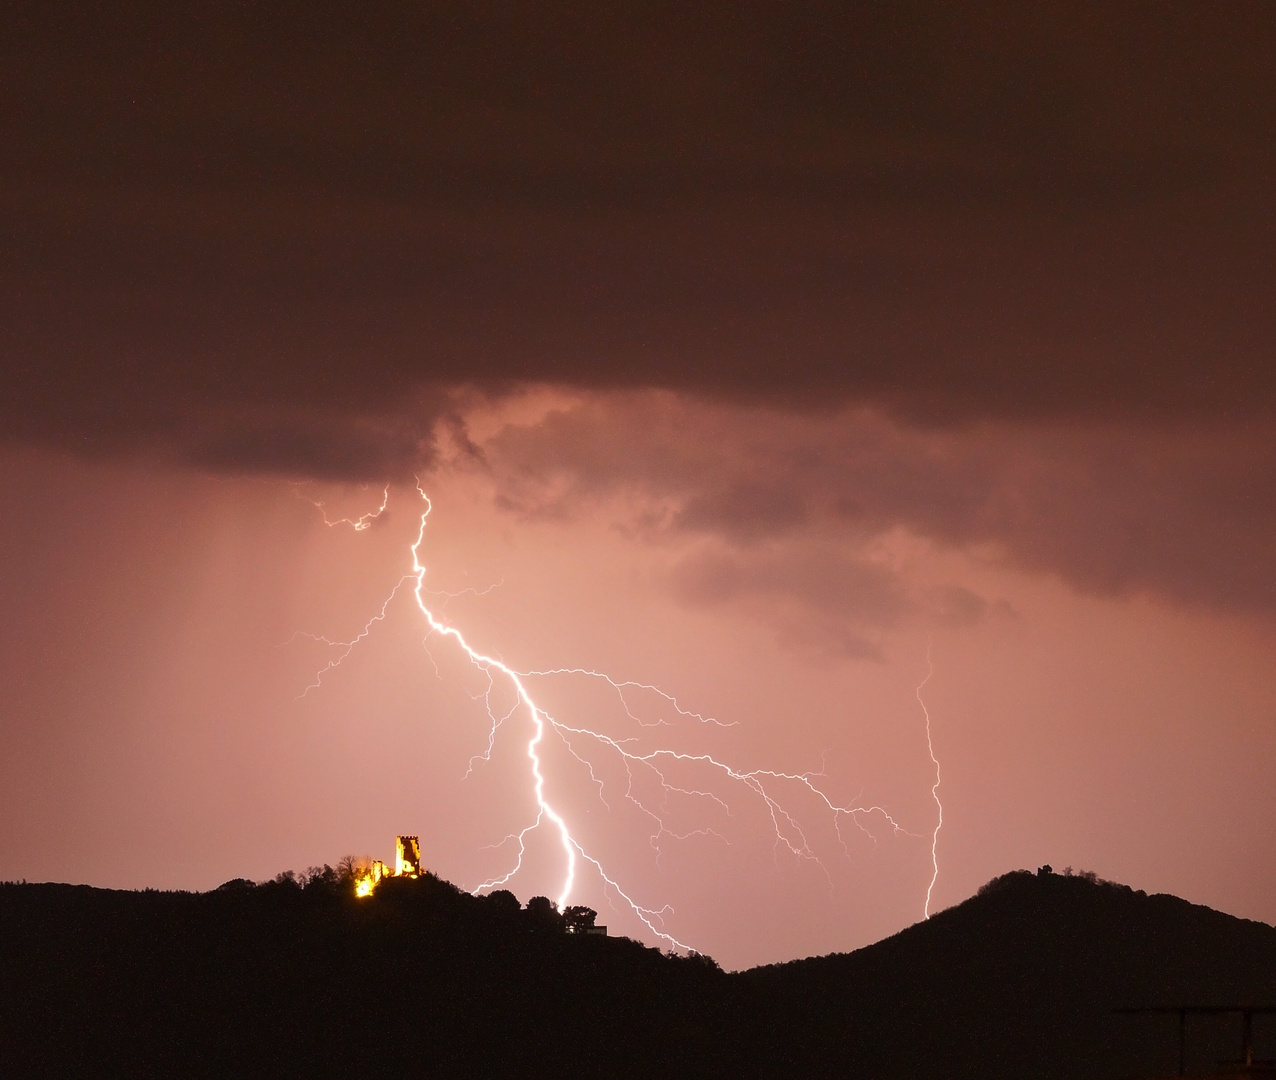 When lightning strikes near Drachenfels